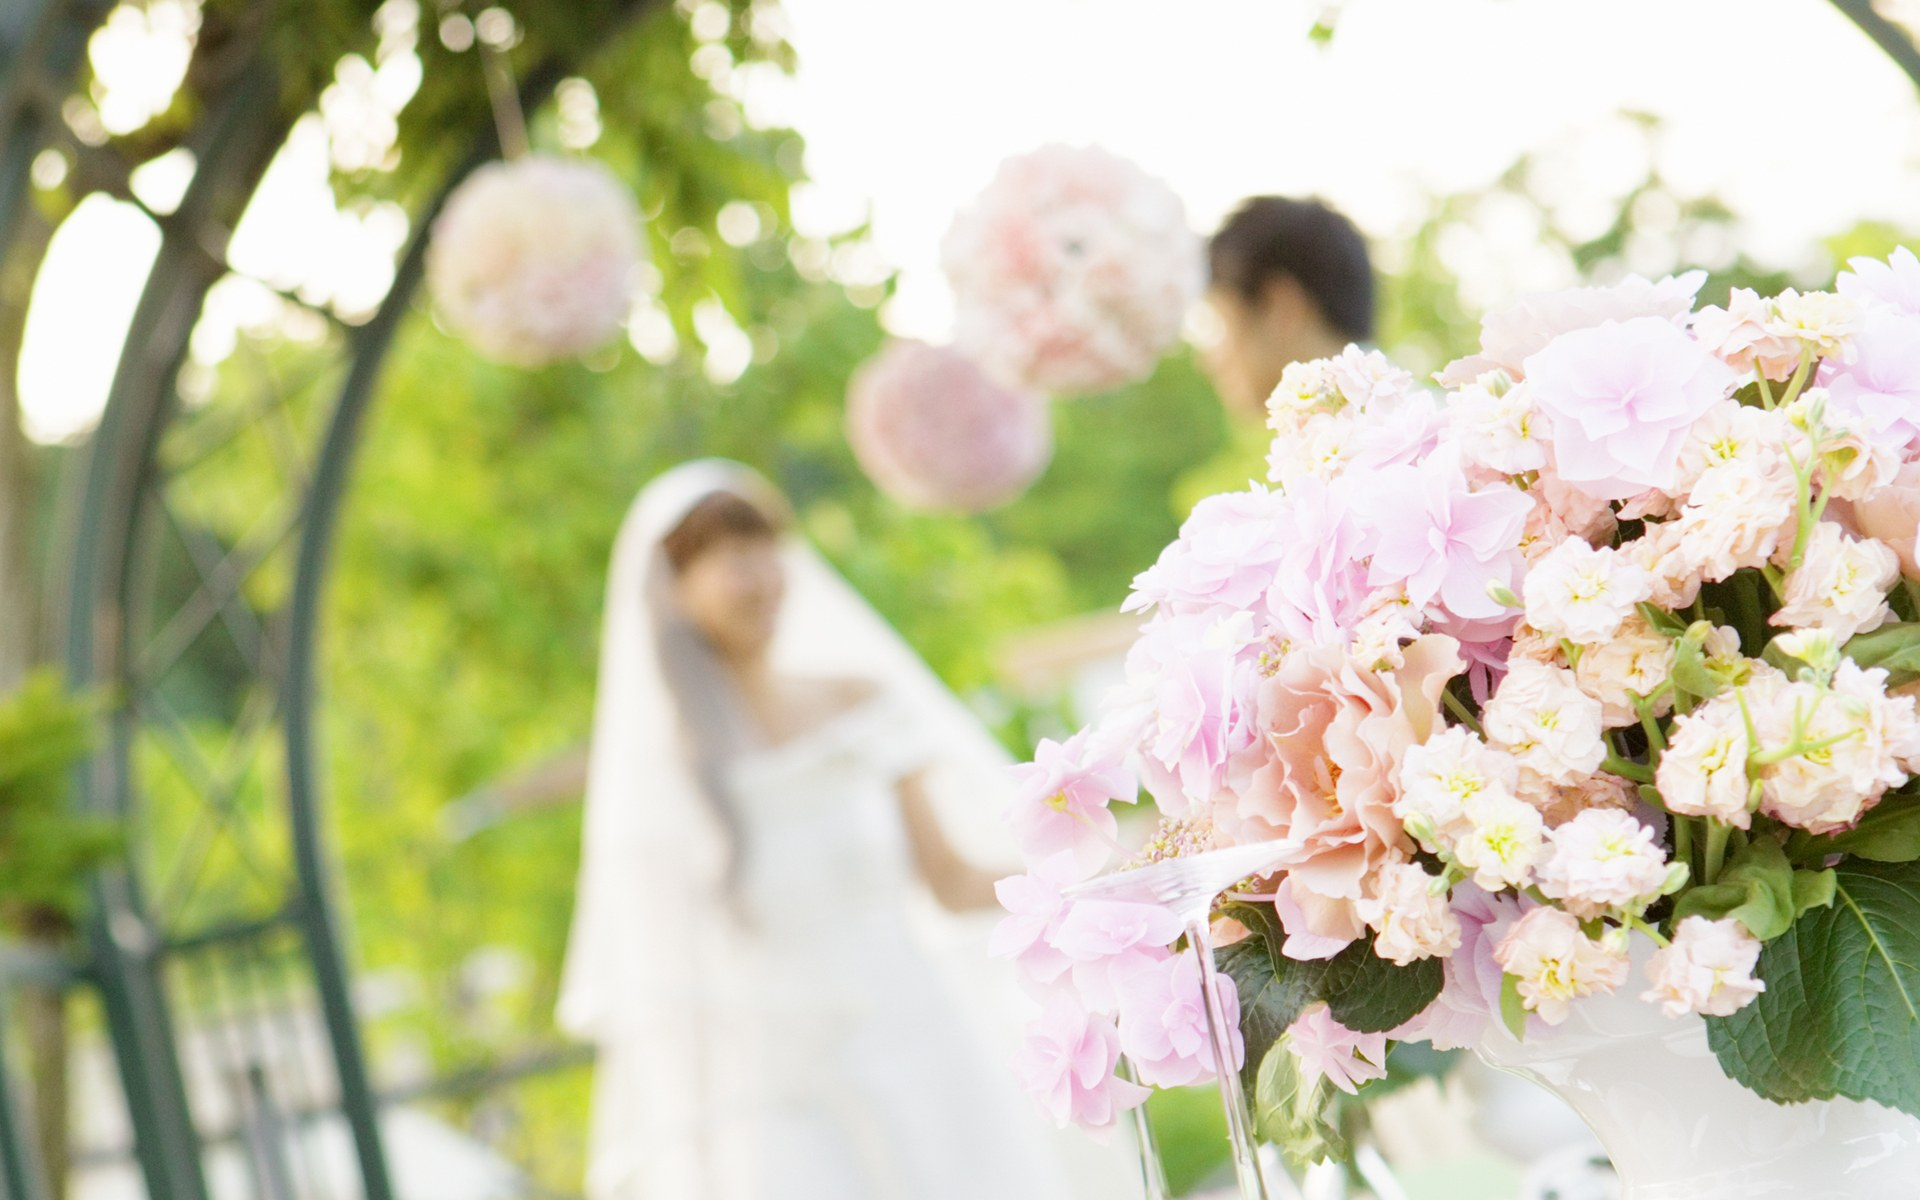 wedding pictures 26813